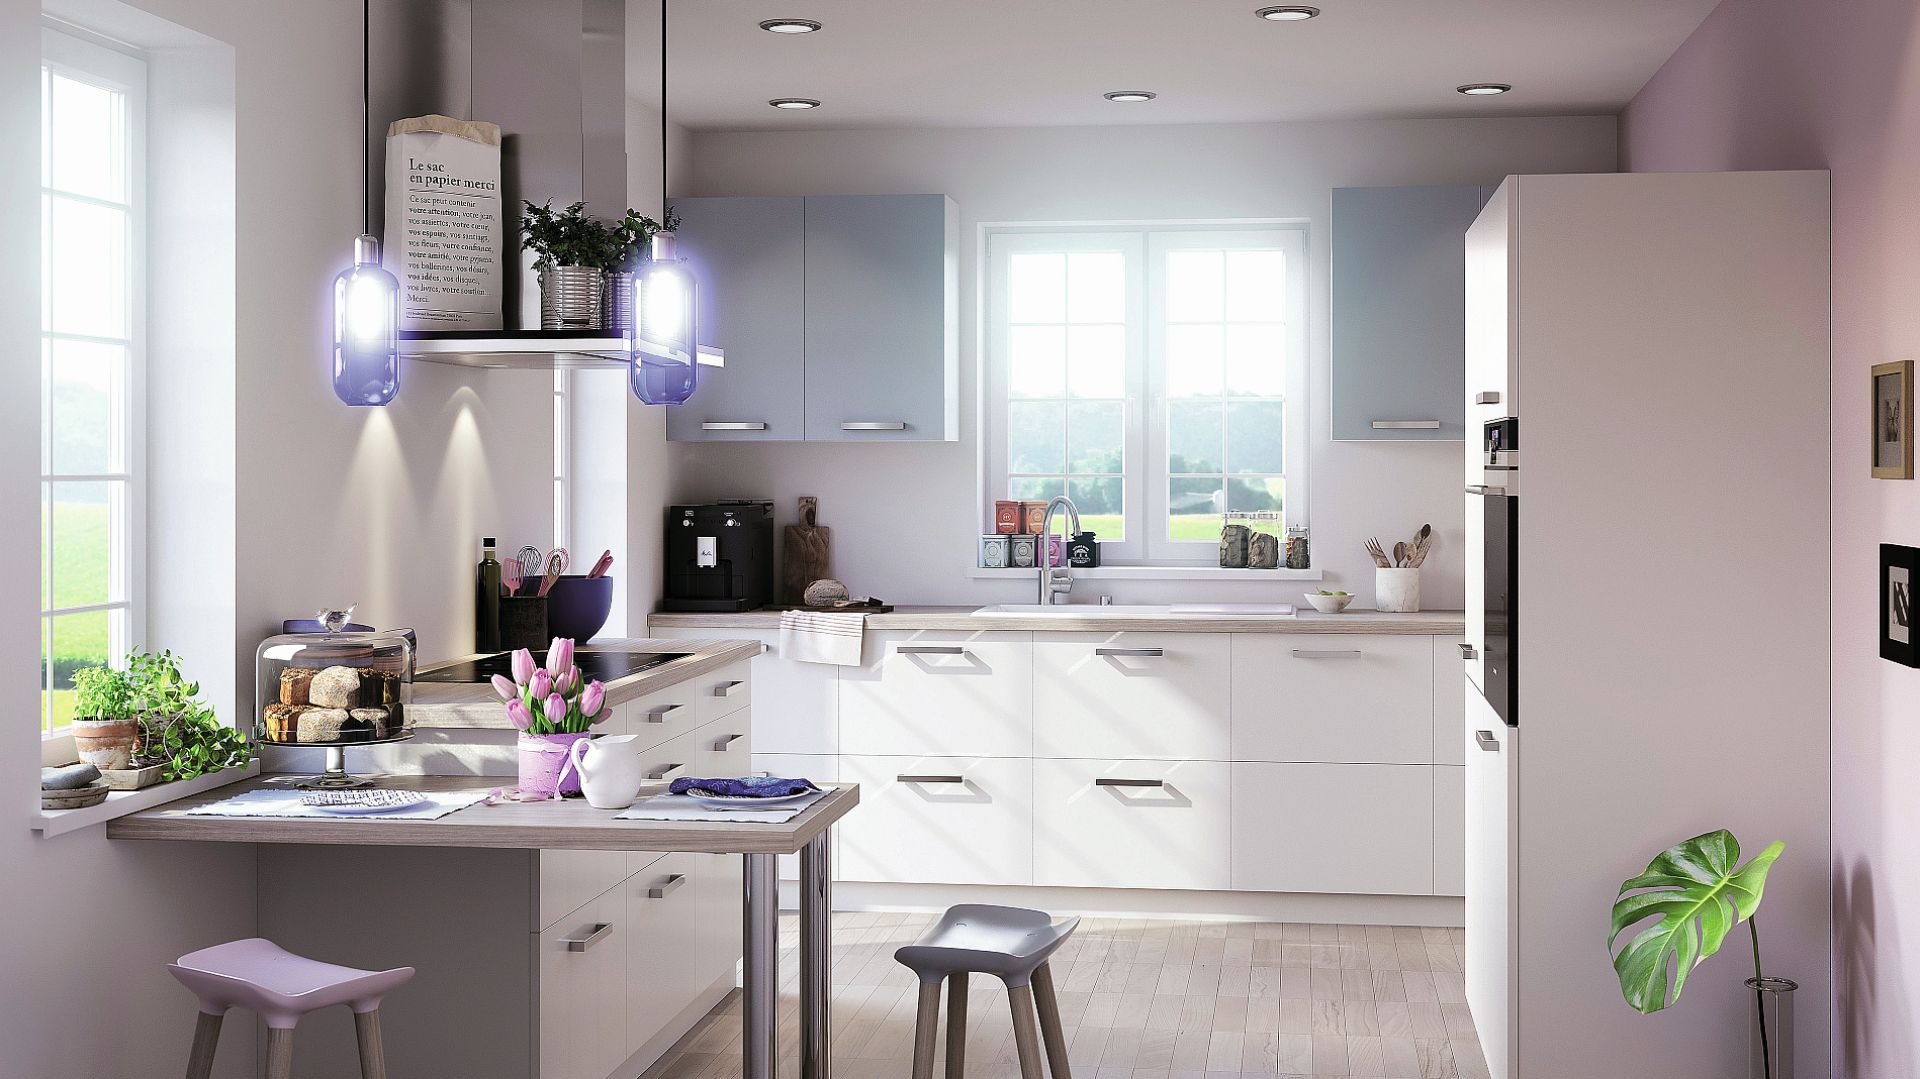 PURE EMOTION – zabudowa kuchenna w białym kolorze. Fot. Brigitte Kuechen